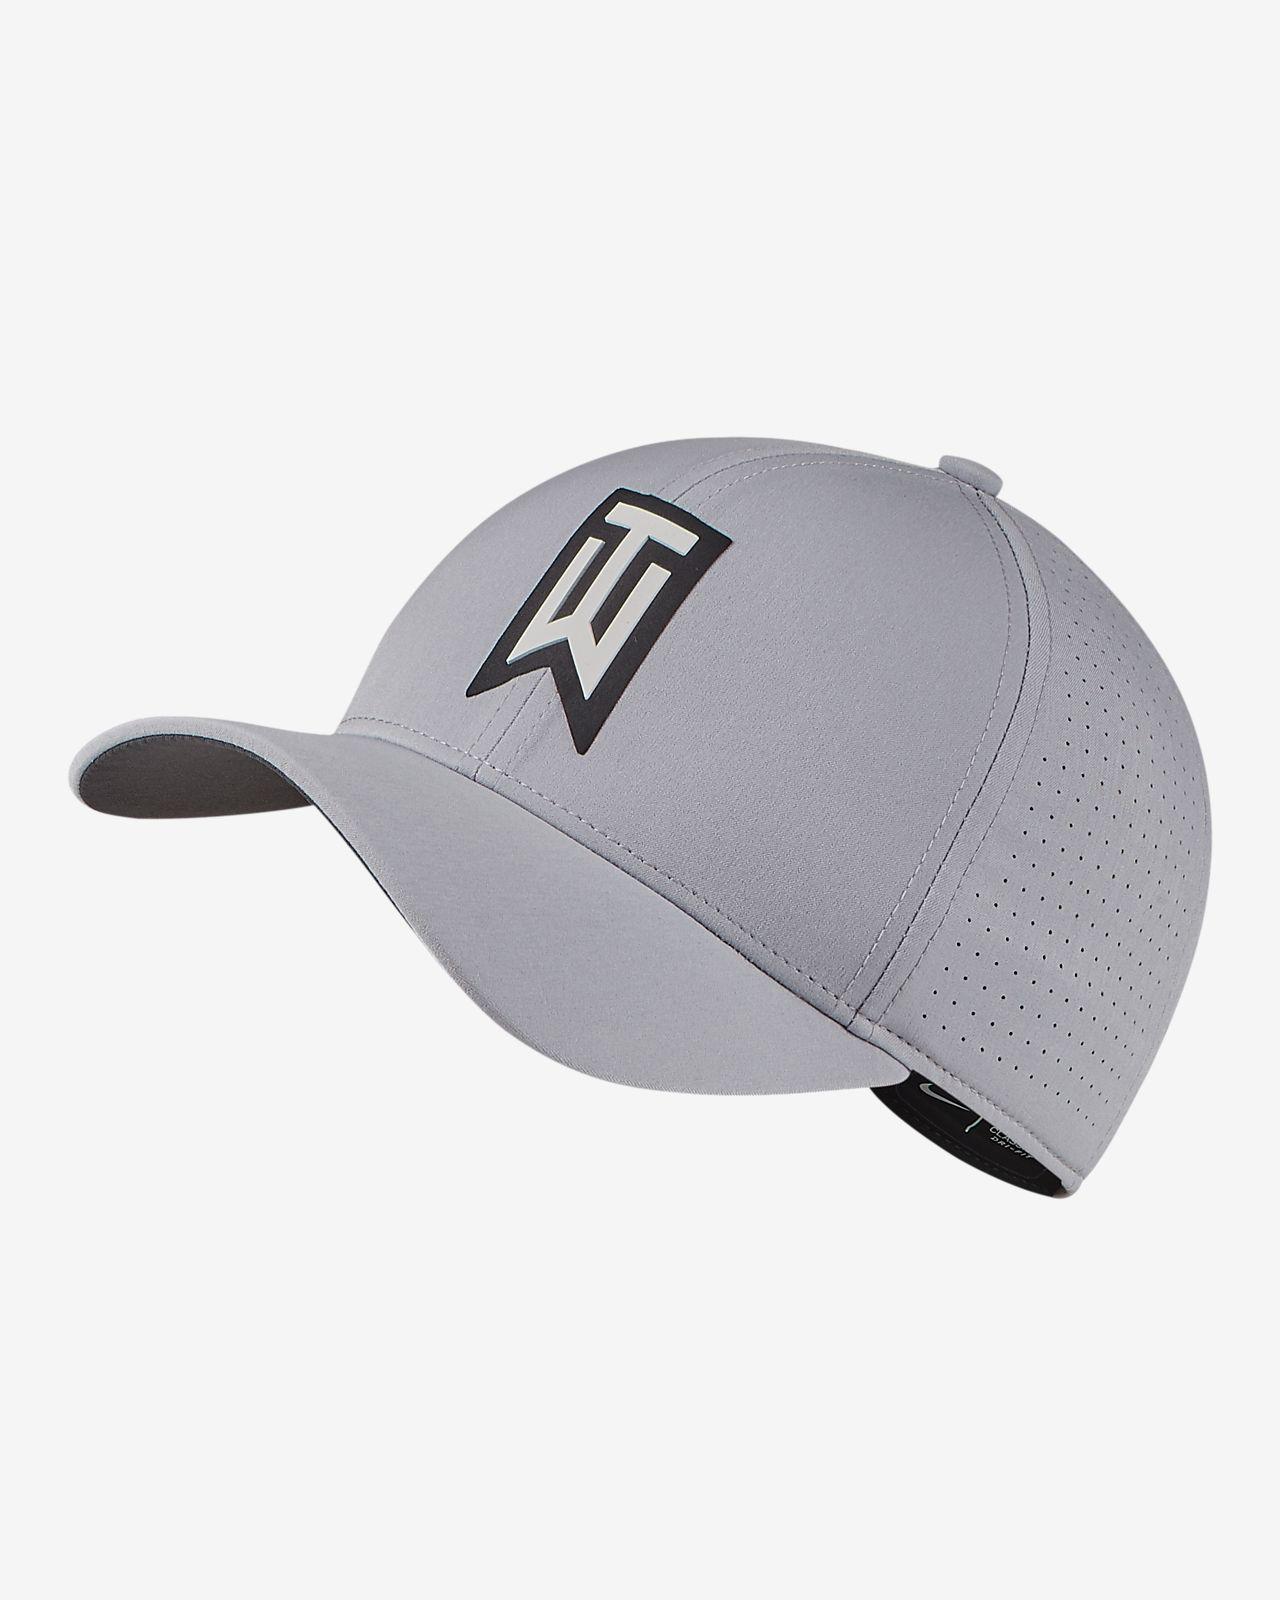 TW AeroBill Classic 99 Fitted Golf Şapkası